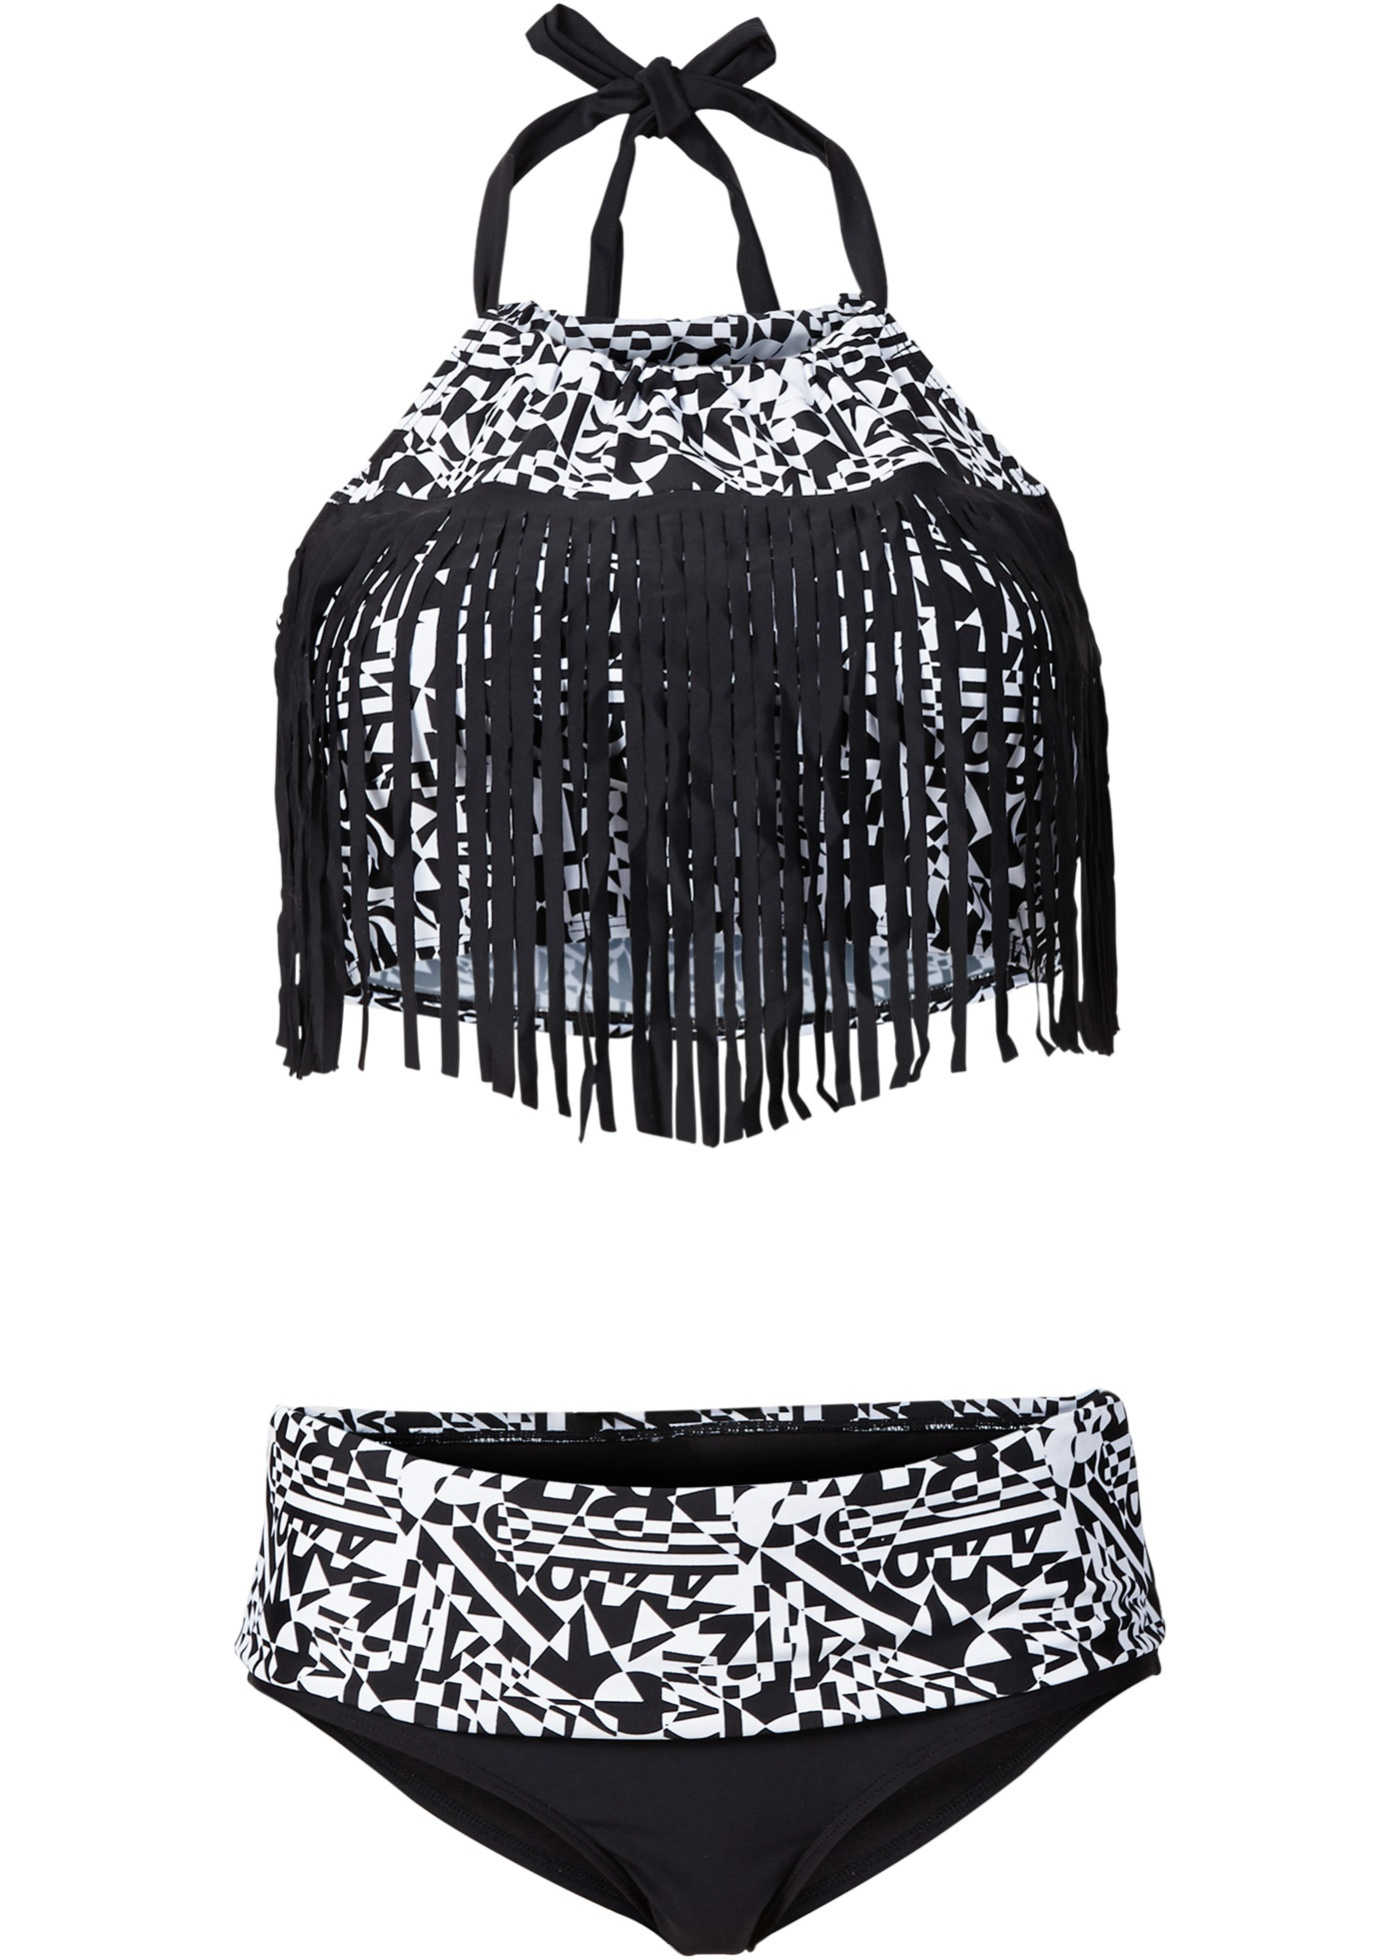 Bademode - Bikini mit Fransen (2 tlg. Set) › bonprix › schwarz  - Onlineshop Bonprix